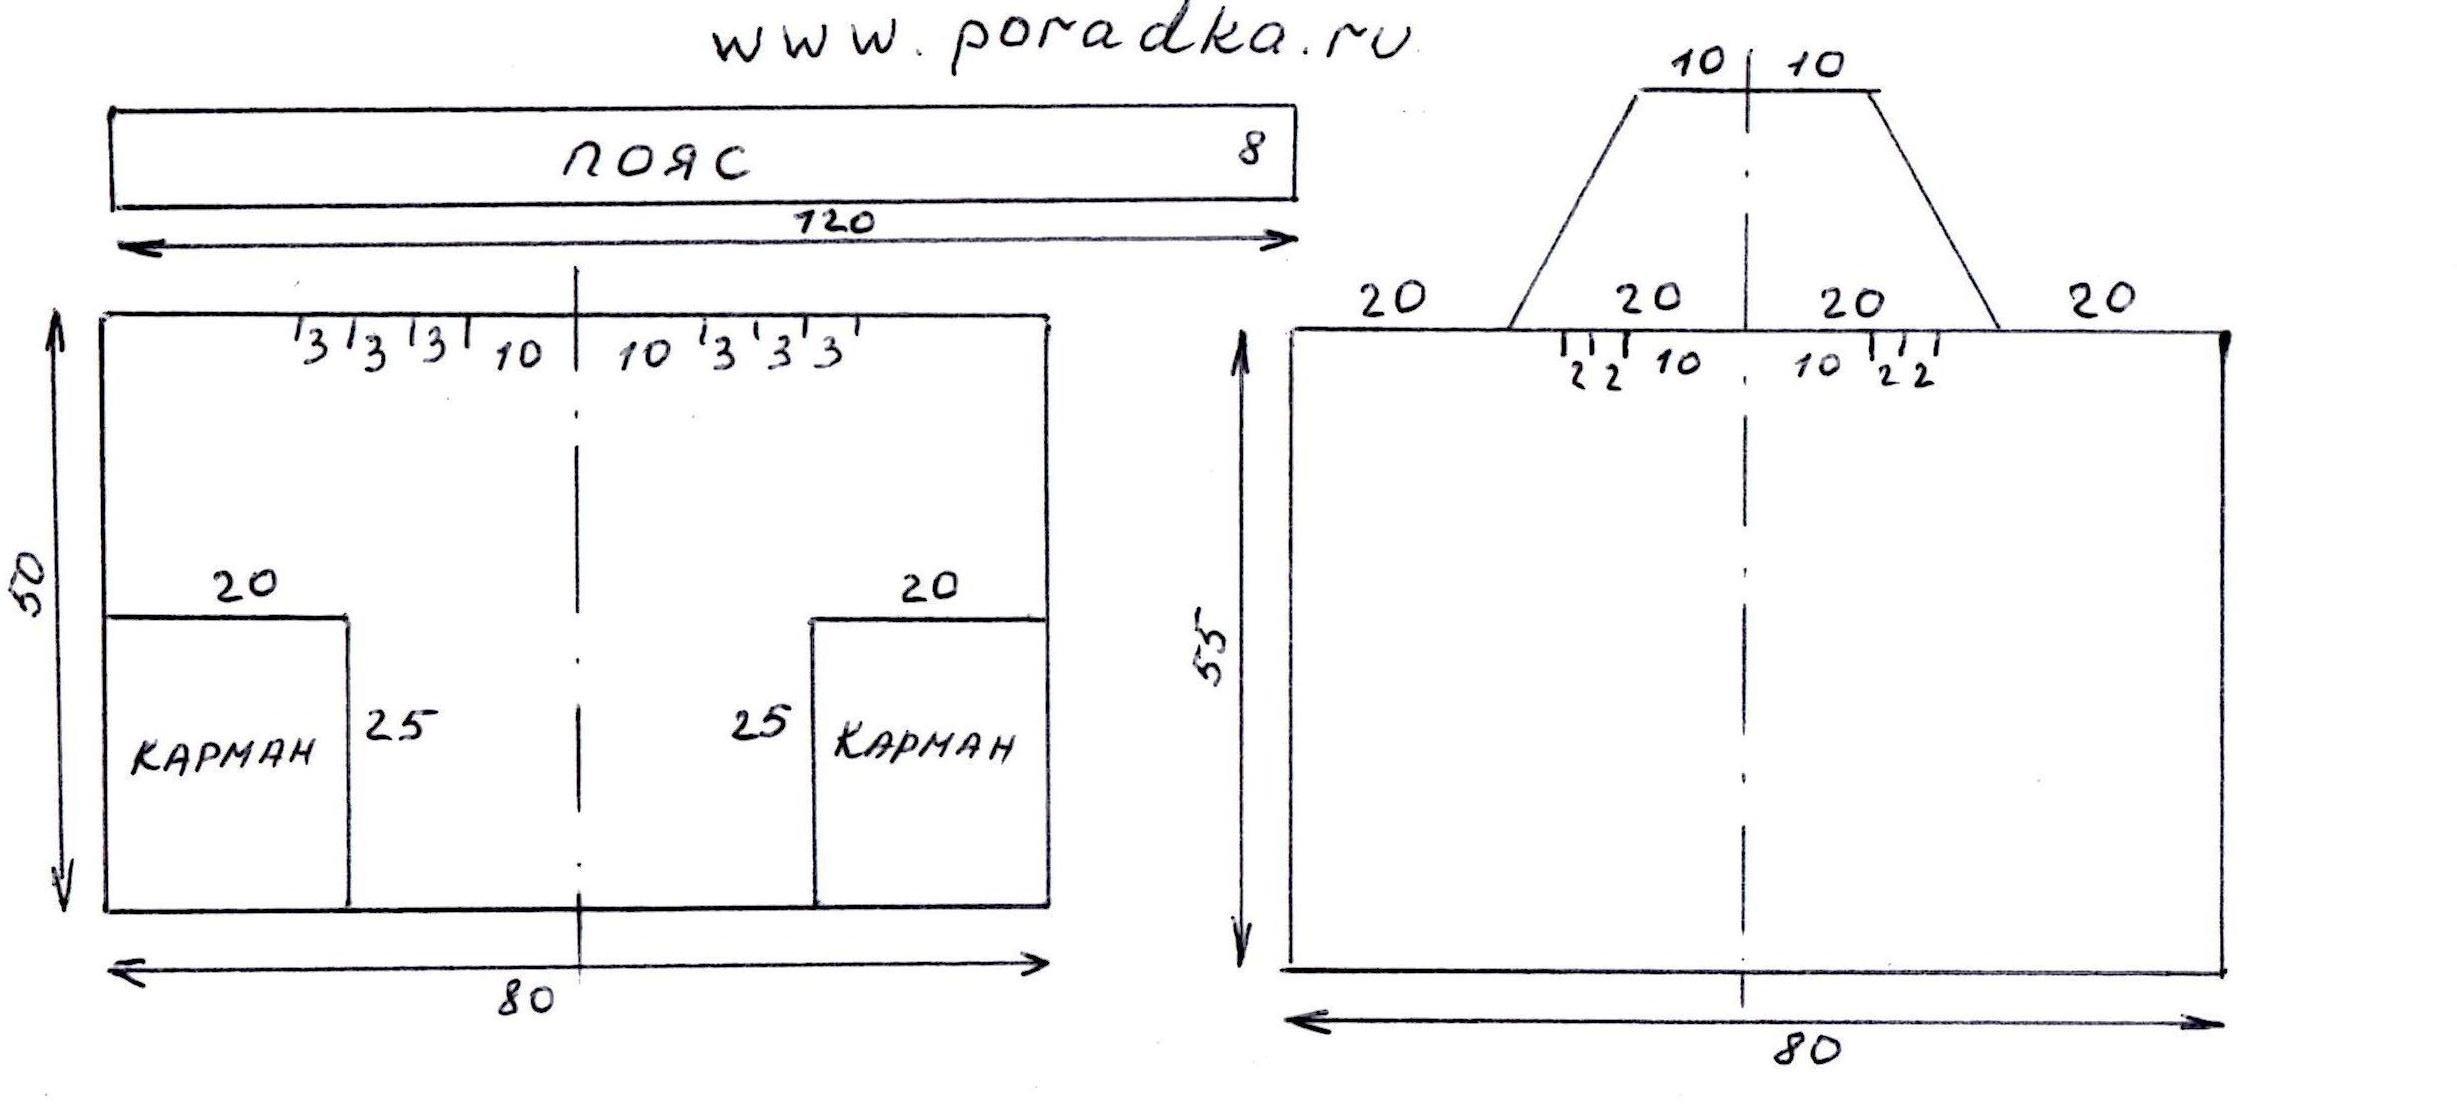 Объединить PDF - Совместите файлы PDF онлайн бесплатно 77